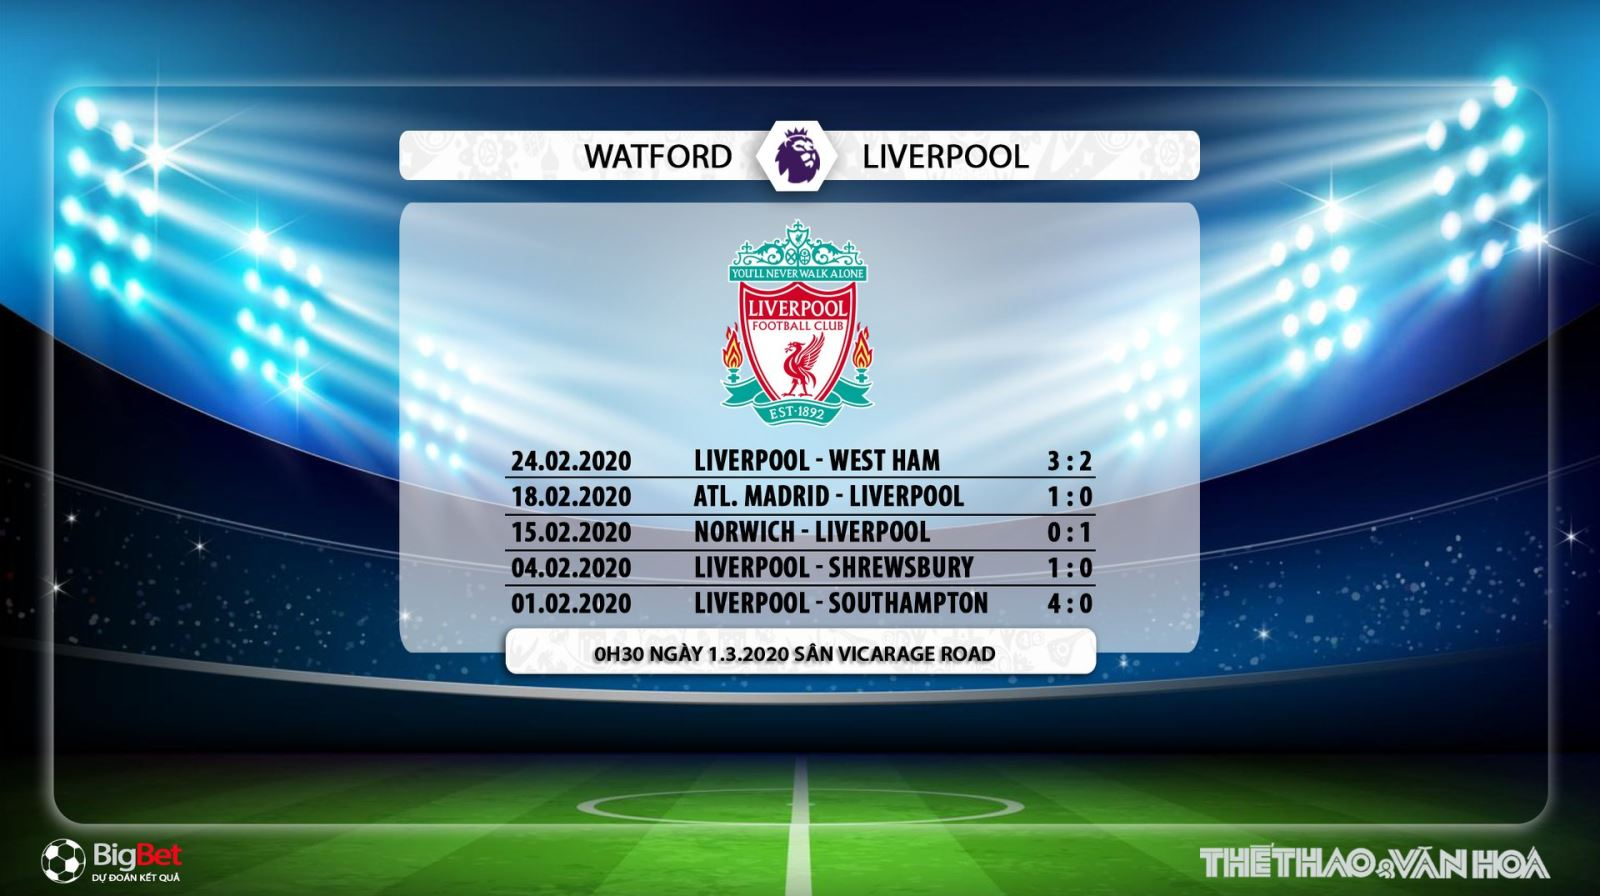 Watford vs Liverpool, Watford, Liverpool, trực tiếp Watford vs Liverpool, dự đoán Watford vs Liverpool, nhận định Watford vs Liverpool, soi kèo Watford vs Liverpool, bóng đá, K+, K+PC, lịch thi đấu